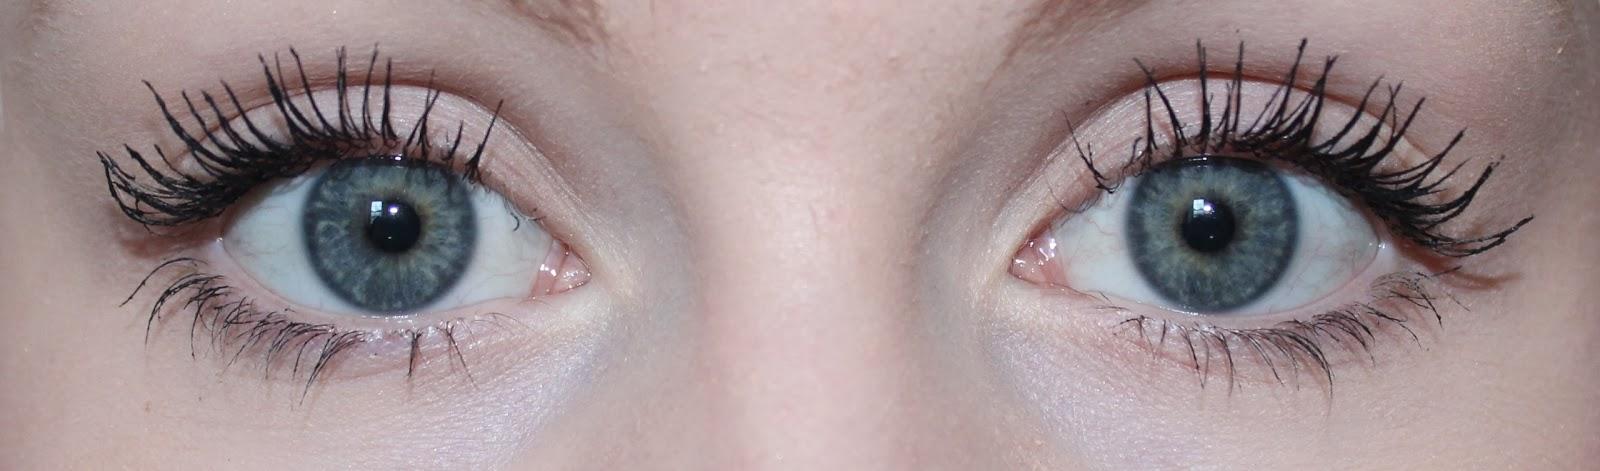 Love Lashes x: Maybelline: Falsies Mascara Black Drama Review